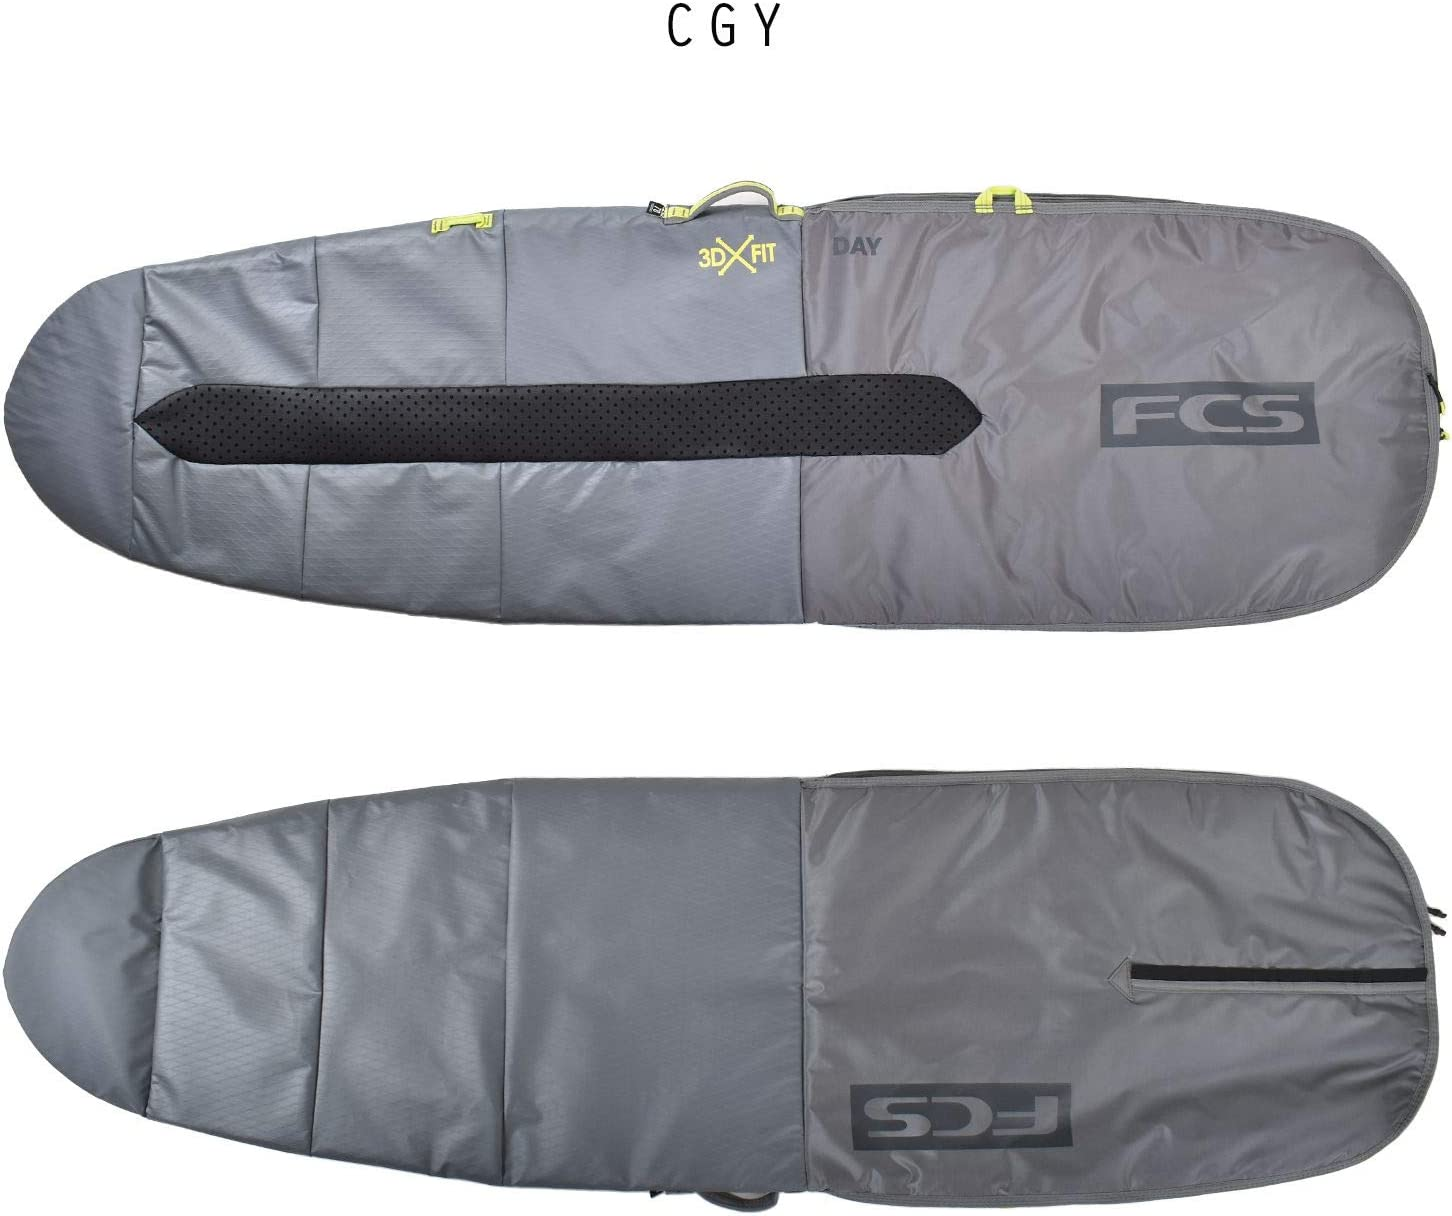 FCS 3DxFit Day Fun Board Surfboard Bag